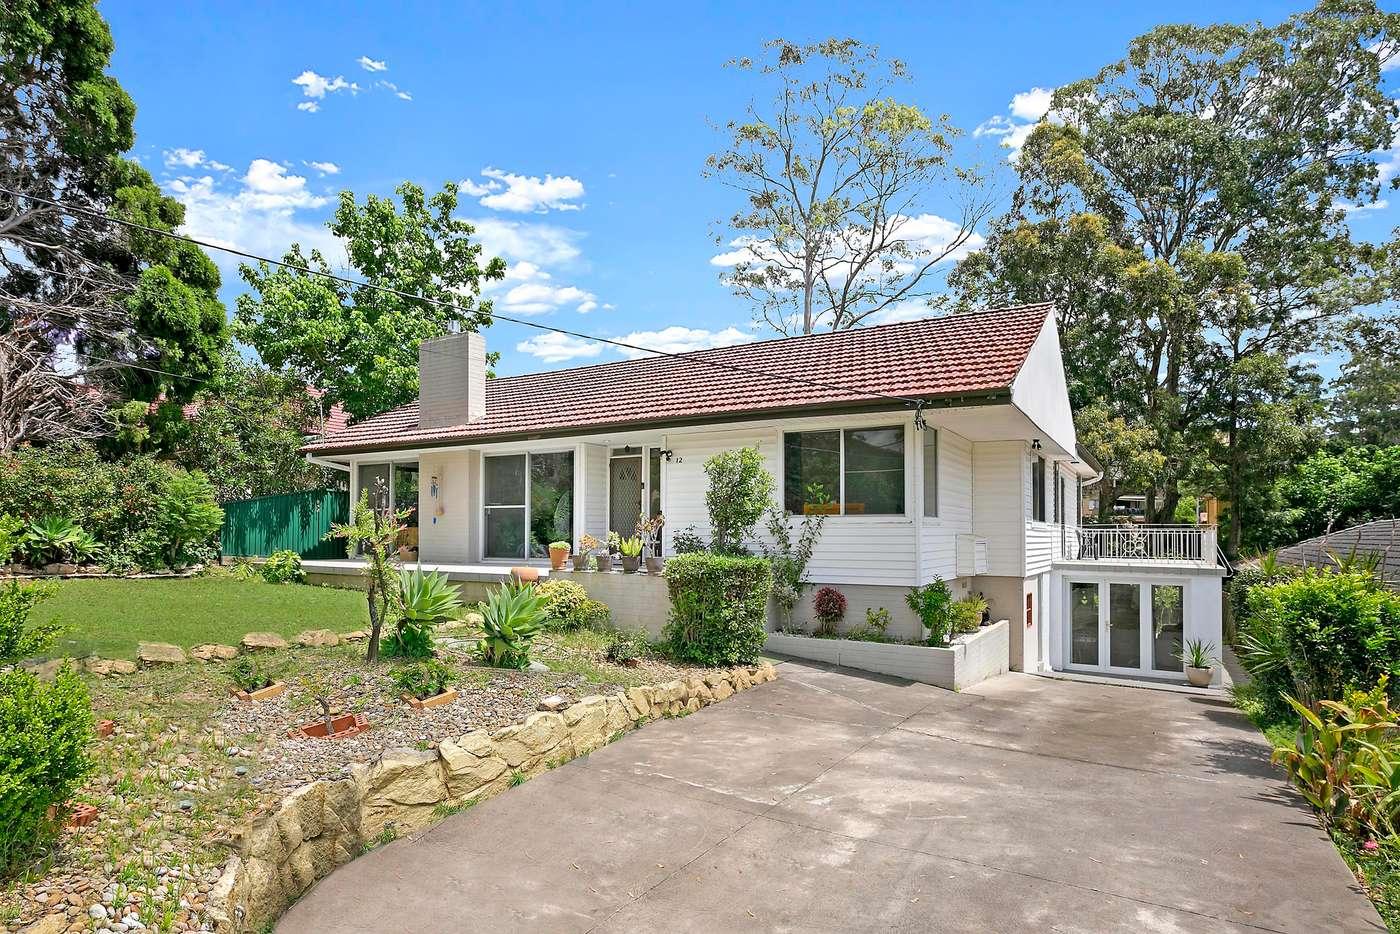 Main view of Homely house listing, 12 Railway Street, Baulkham Hills NSW 2153